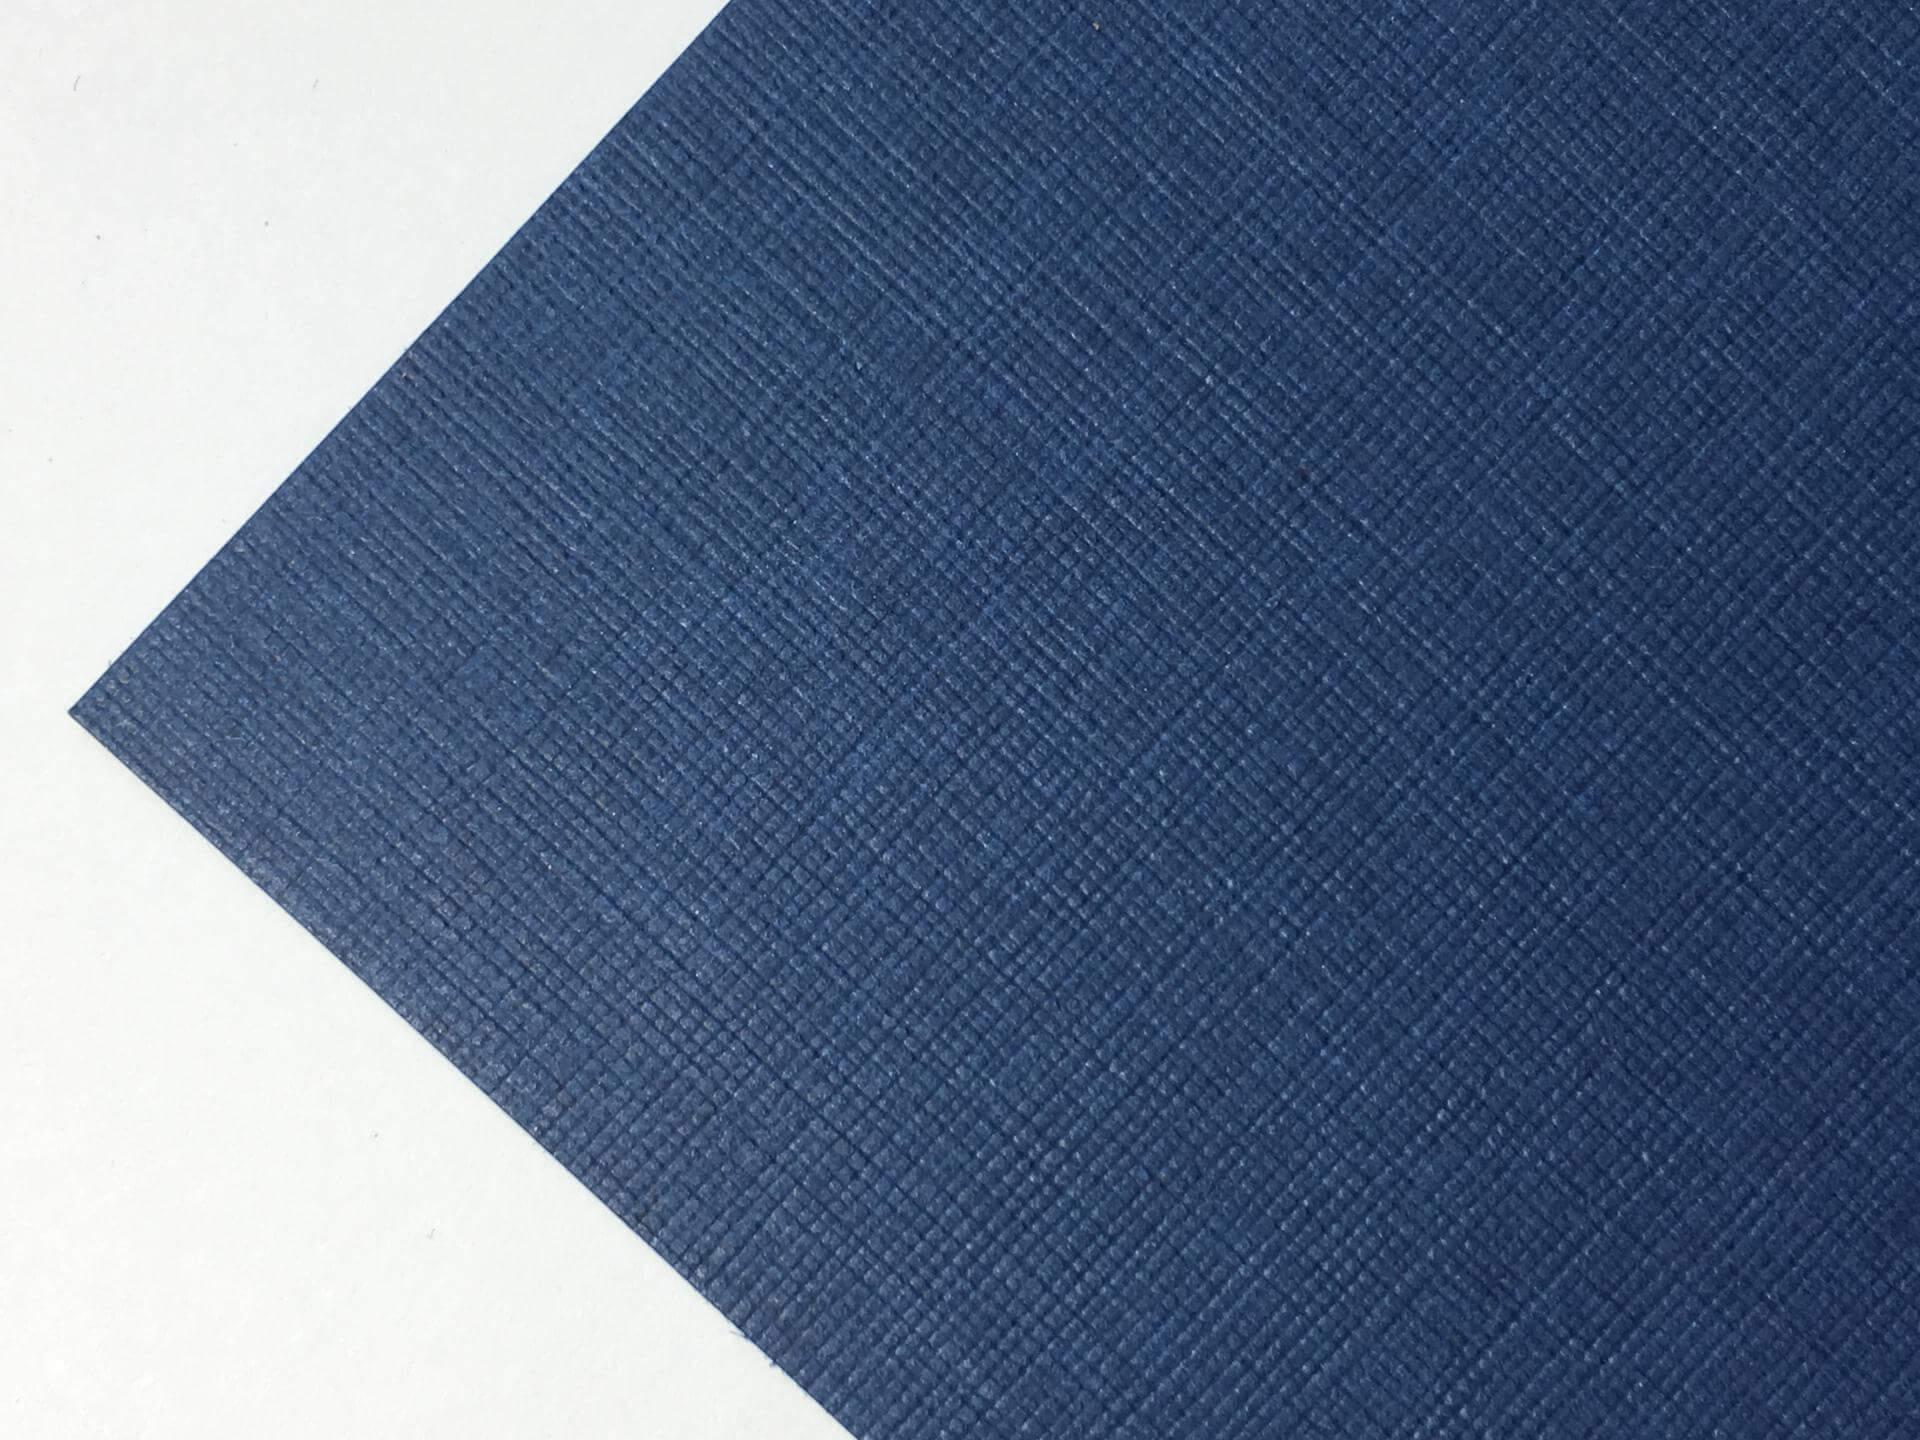 Imitlin fiandra blu scuro